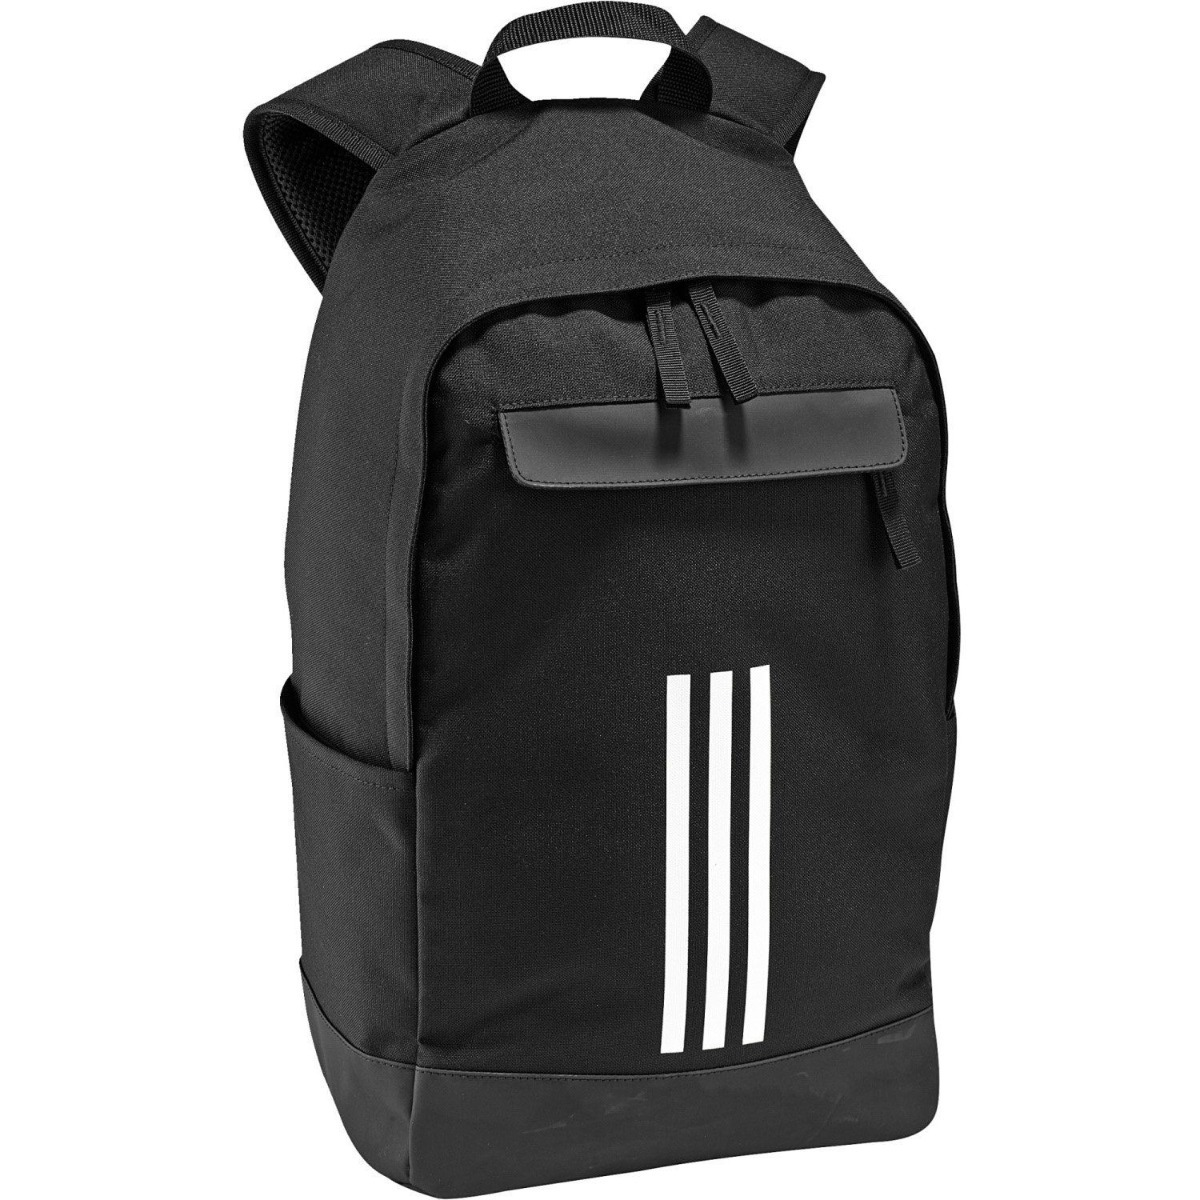 Backpack Negra Adidas Adidas Mochila Classic Mochila Classic Backpack 5jL34ARq